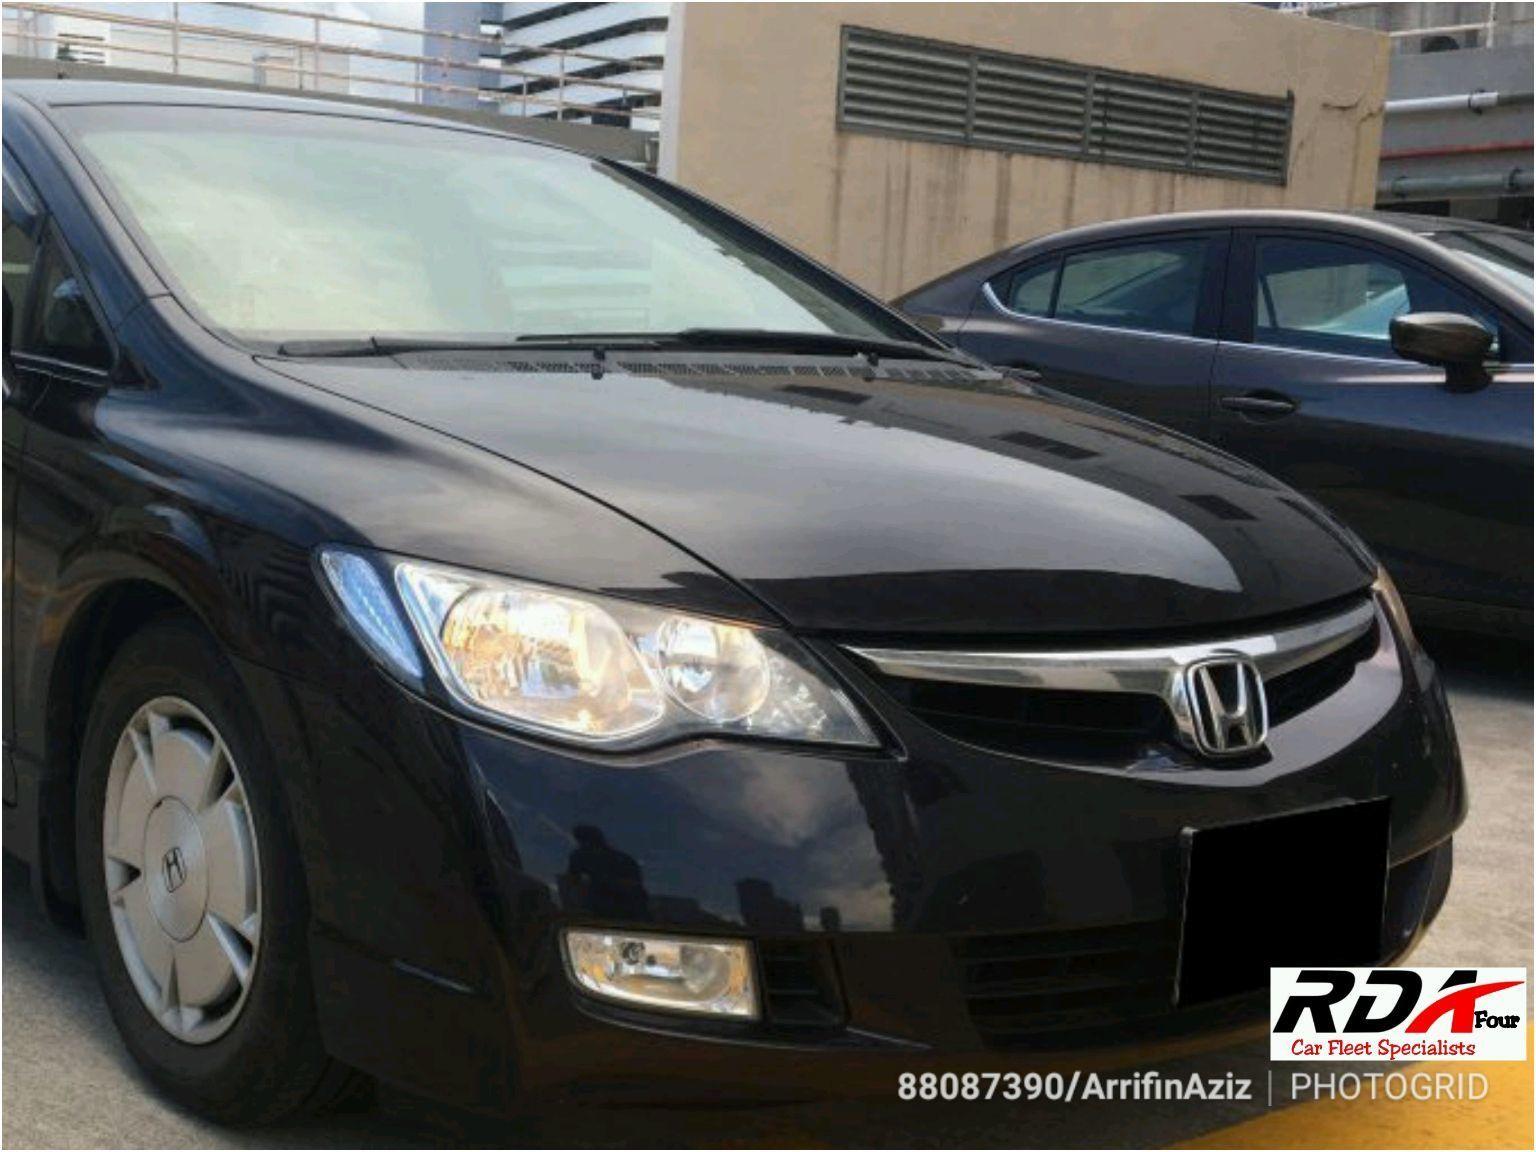 Honda Civic Hybrid Auto Cars Cars For Sale On Carousell